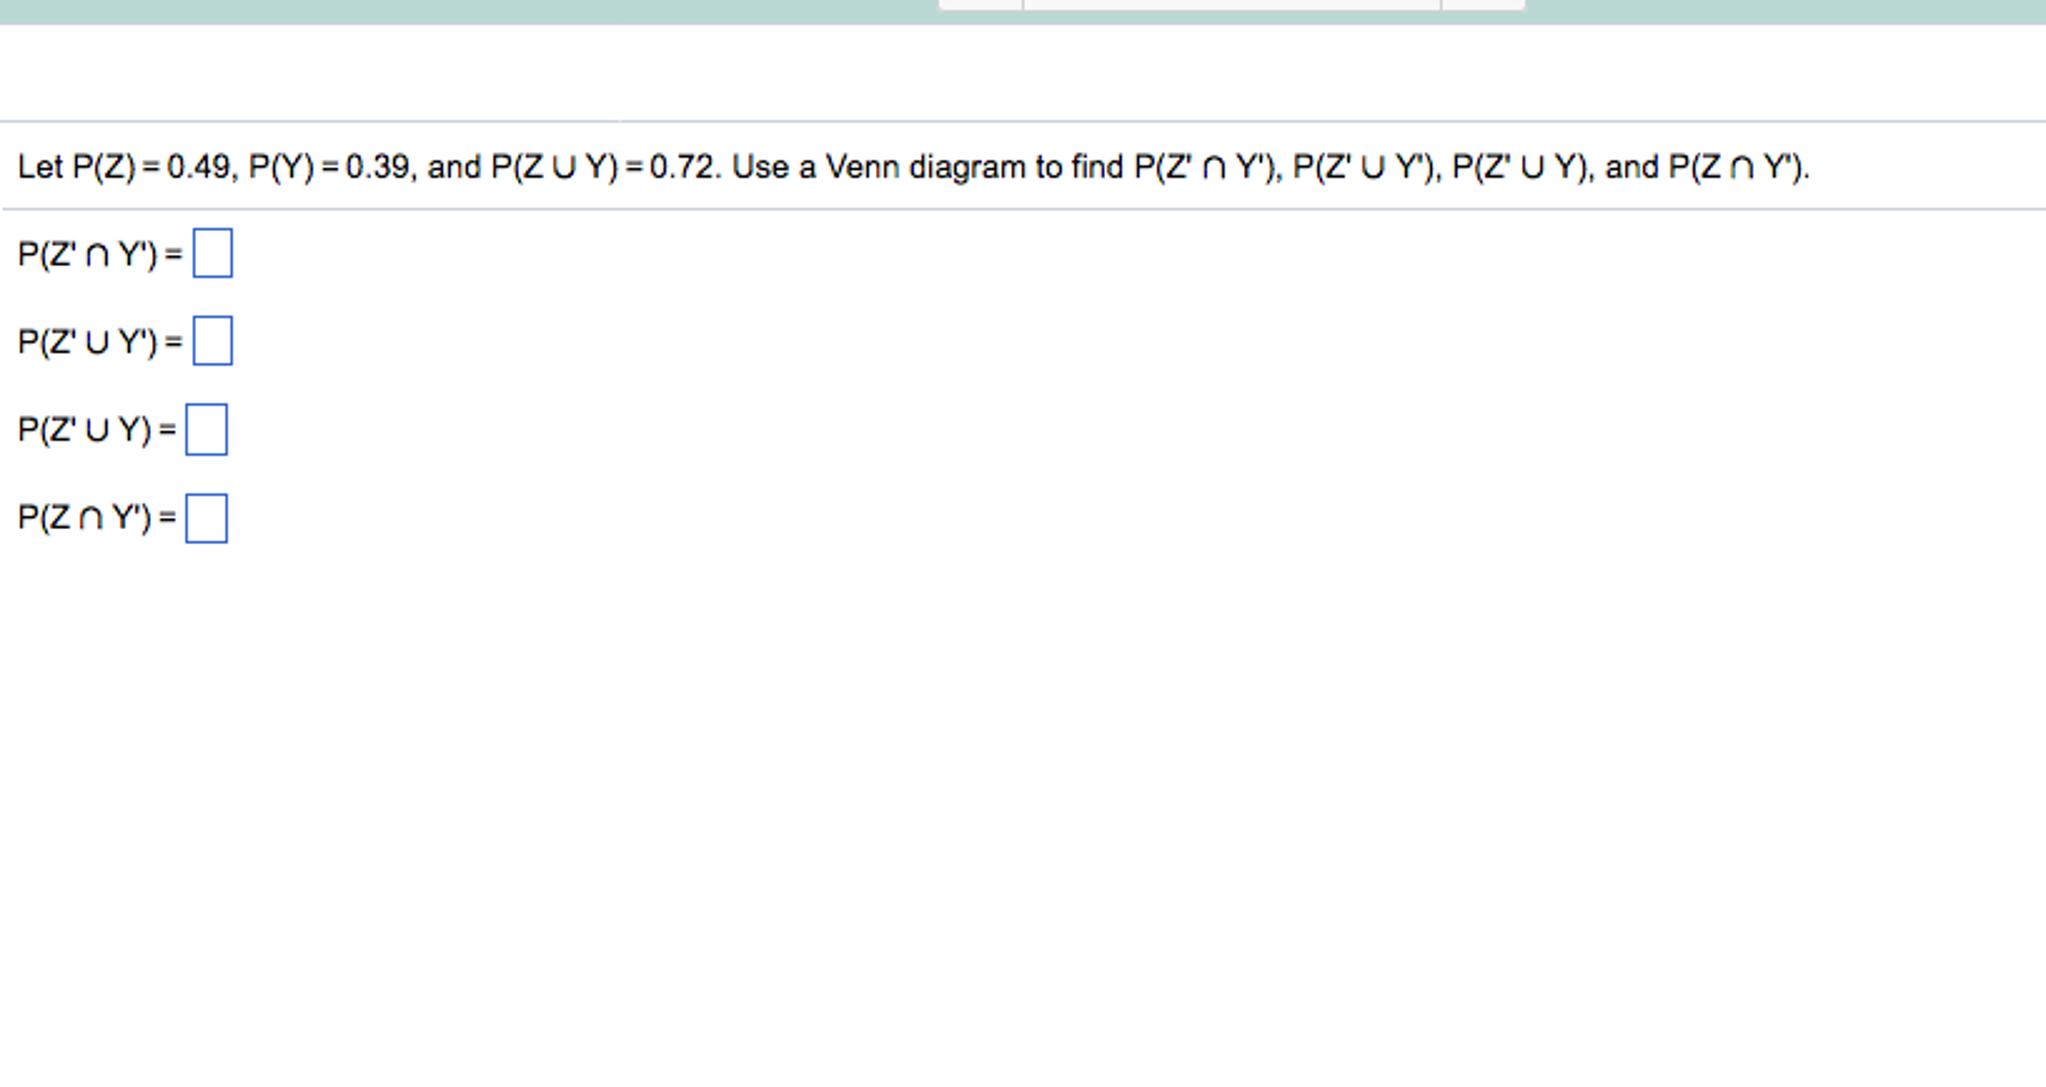 Venn diagrams for categorical syllogisms images diagram design ideas solve venn diagram sales process workflow patch panel visio stencils b727 8c303ca6c0752fphpslewog let p z 049 p y pooptronica Gallery